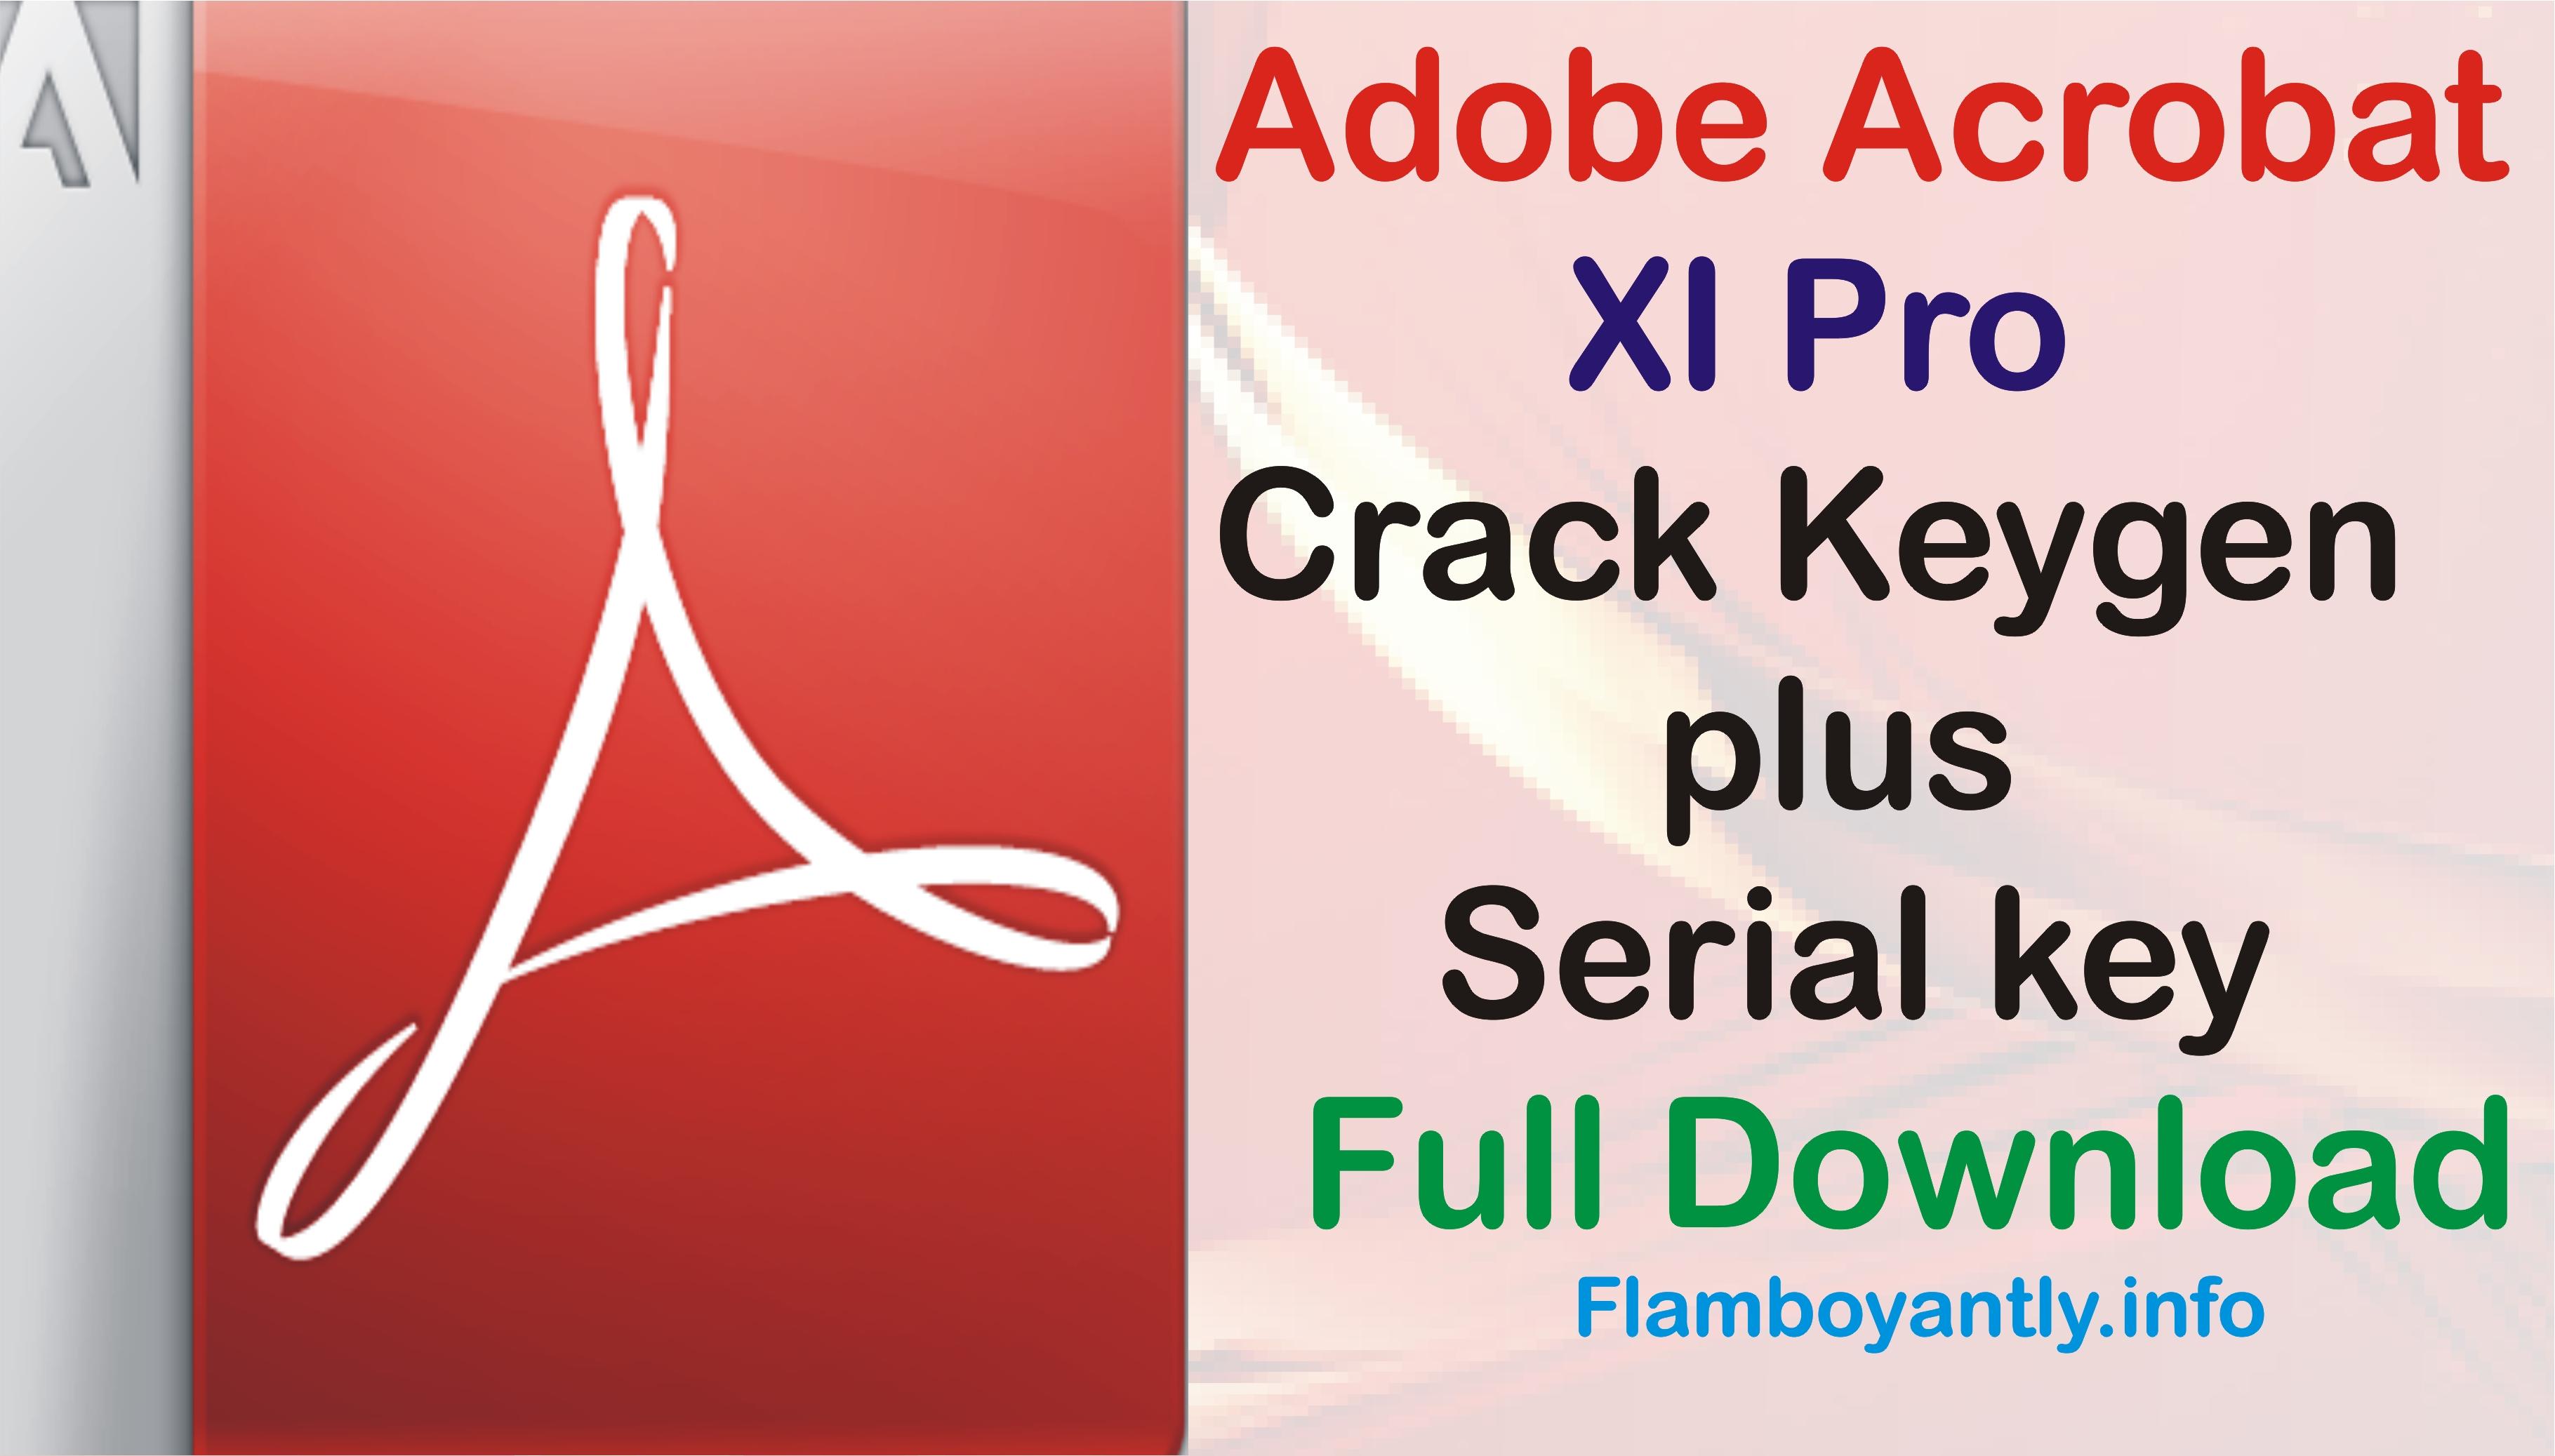 acrobat reader xi crack